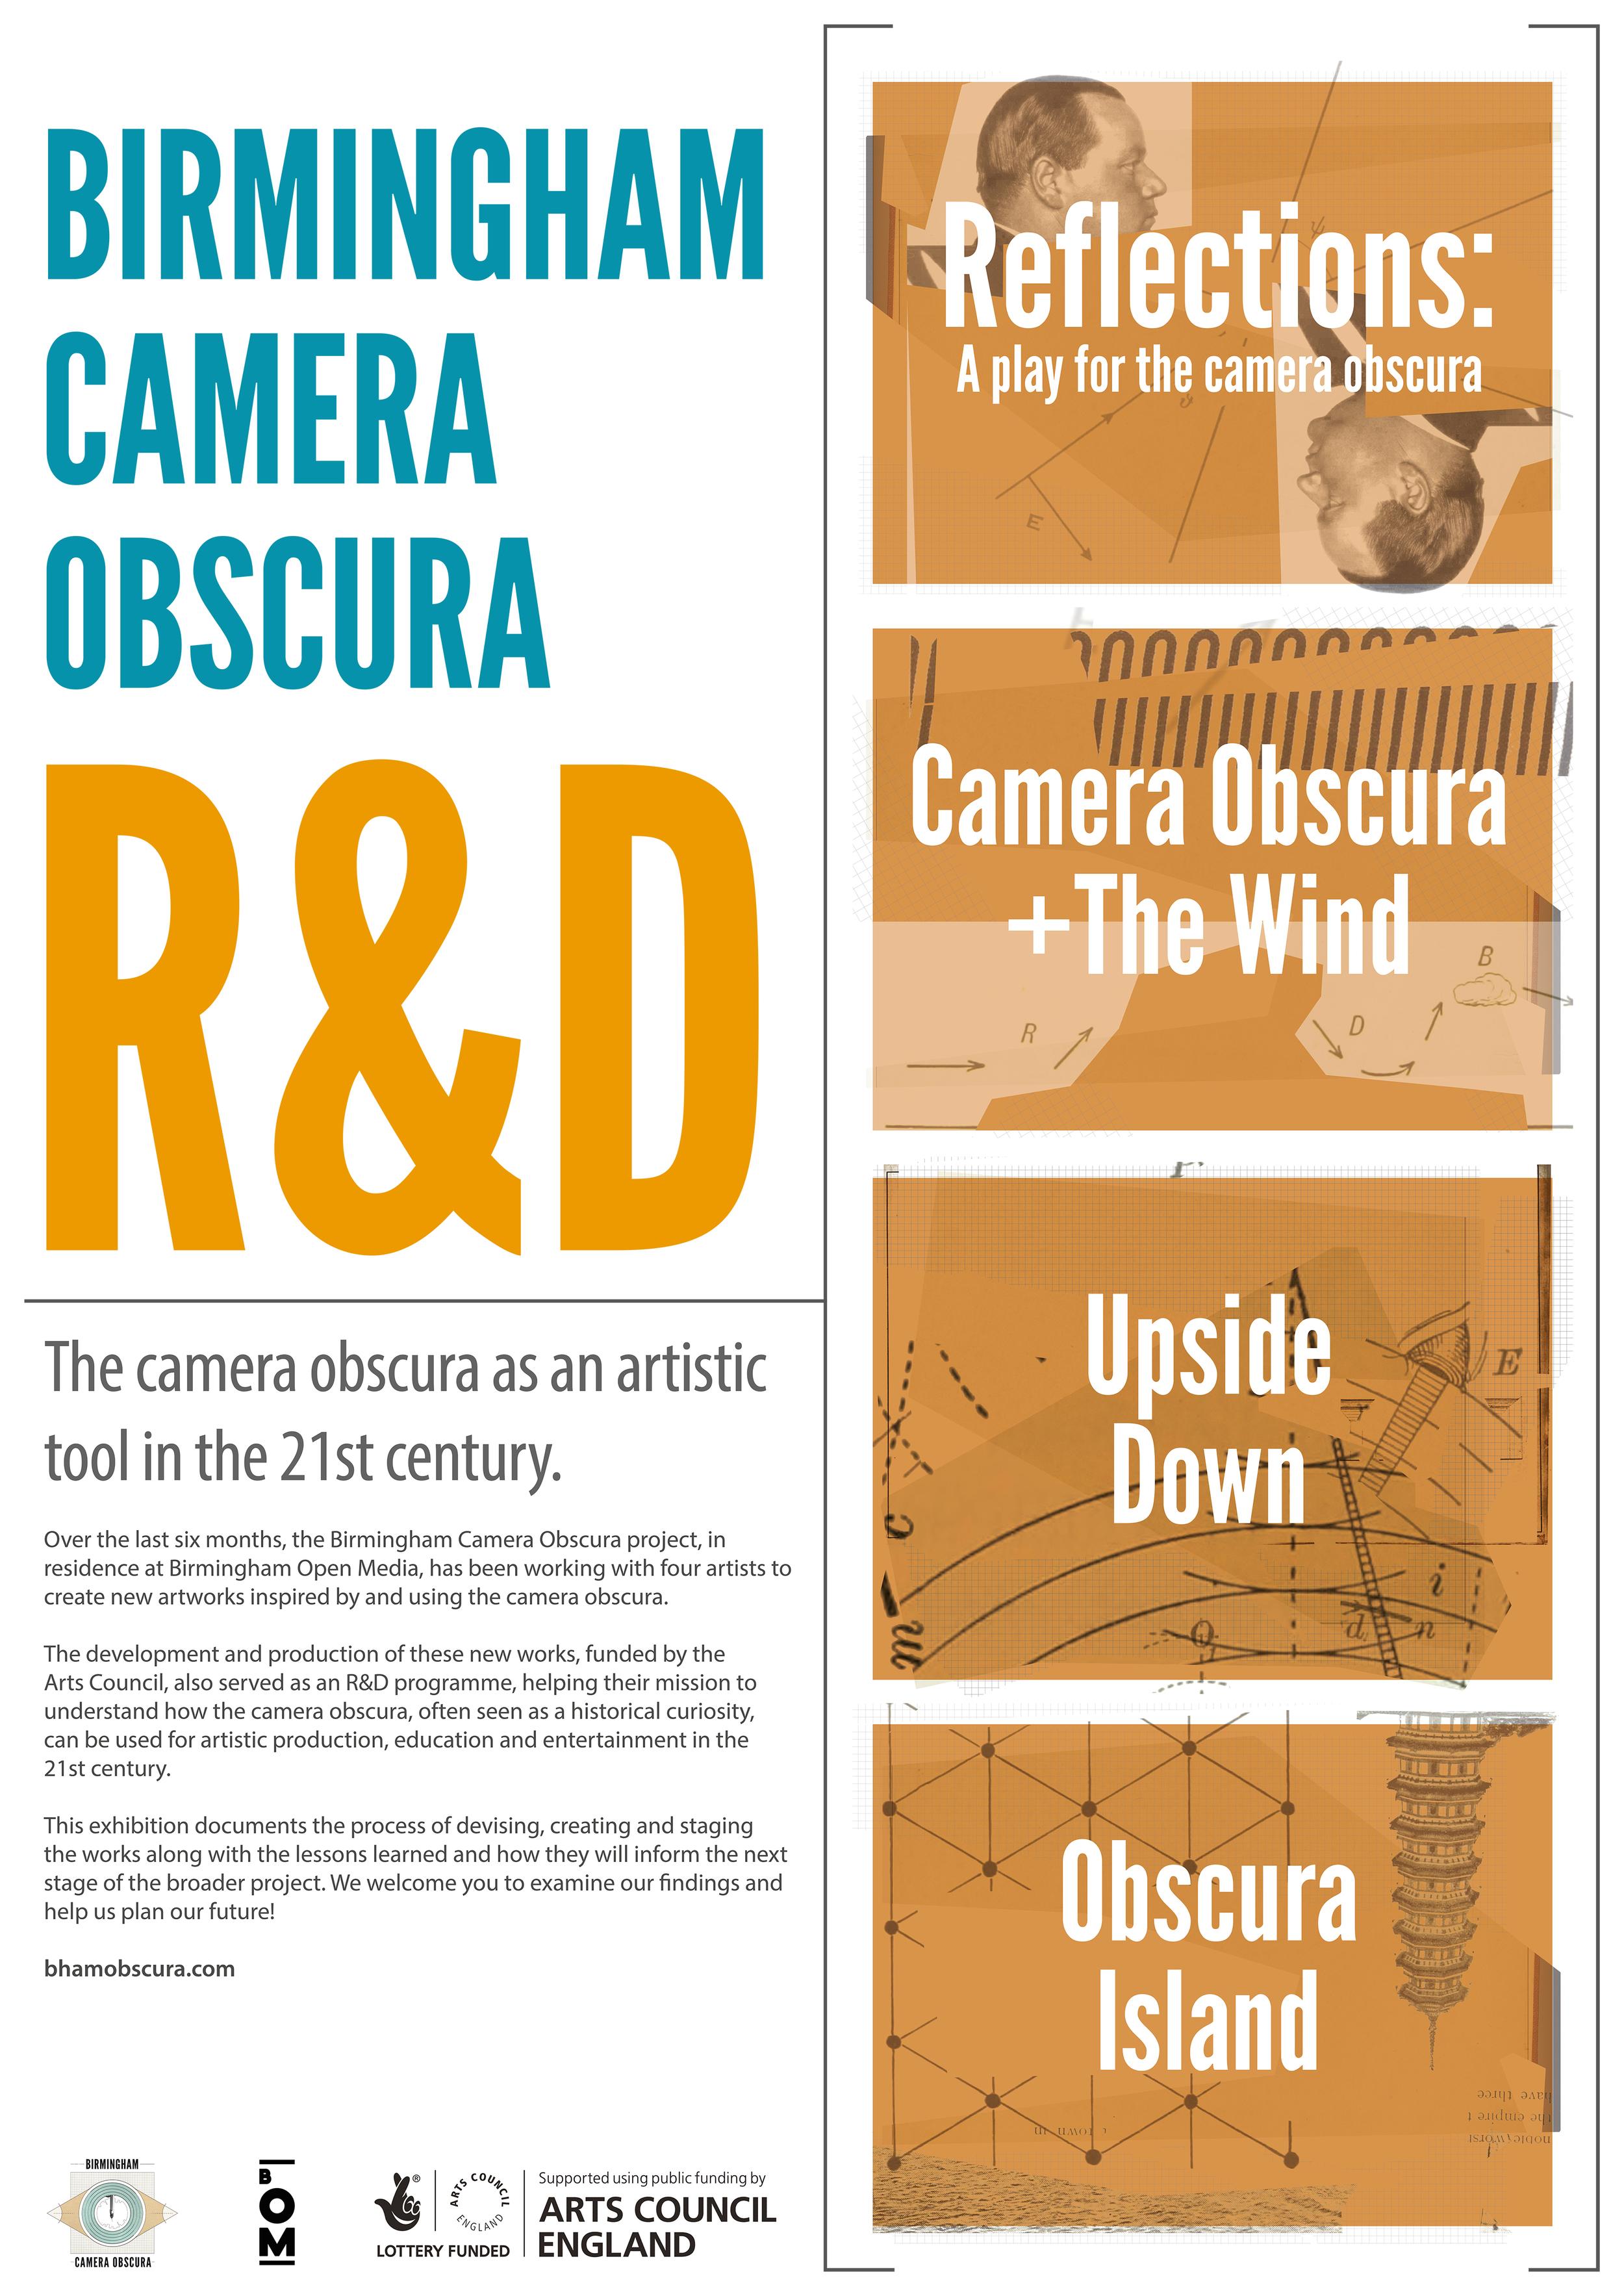 Birmingham Camera Obscura - R&D exhibition